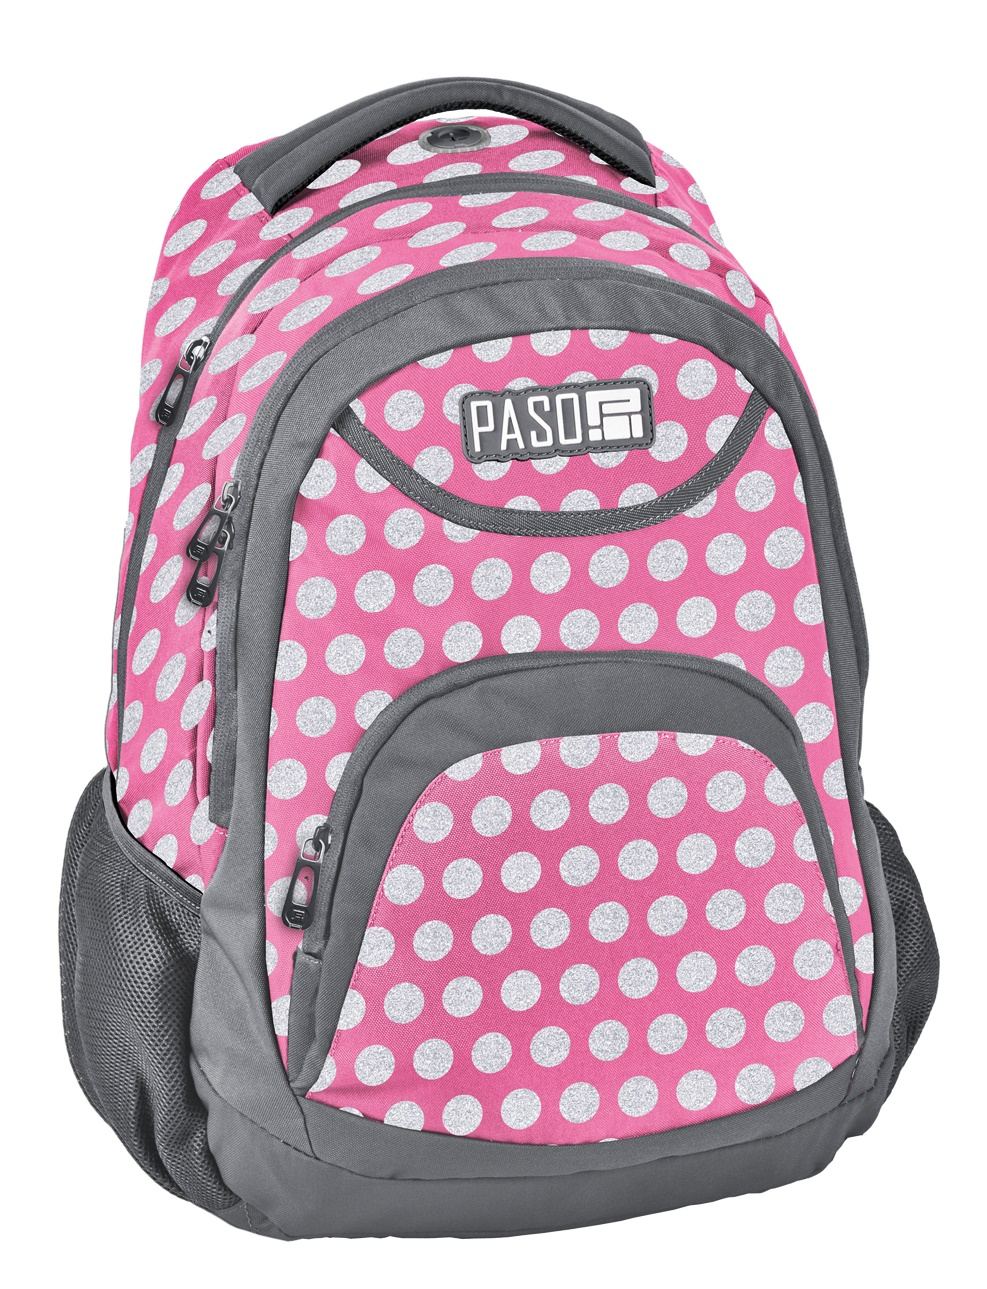 738afde86ec63 Paso plecak szkolny Multicolour 18-2708PI/16 7259354638 - Allegro.pl